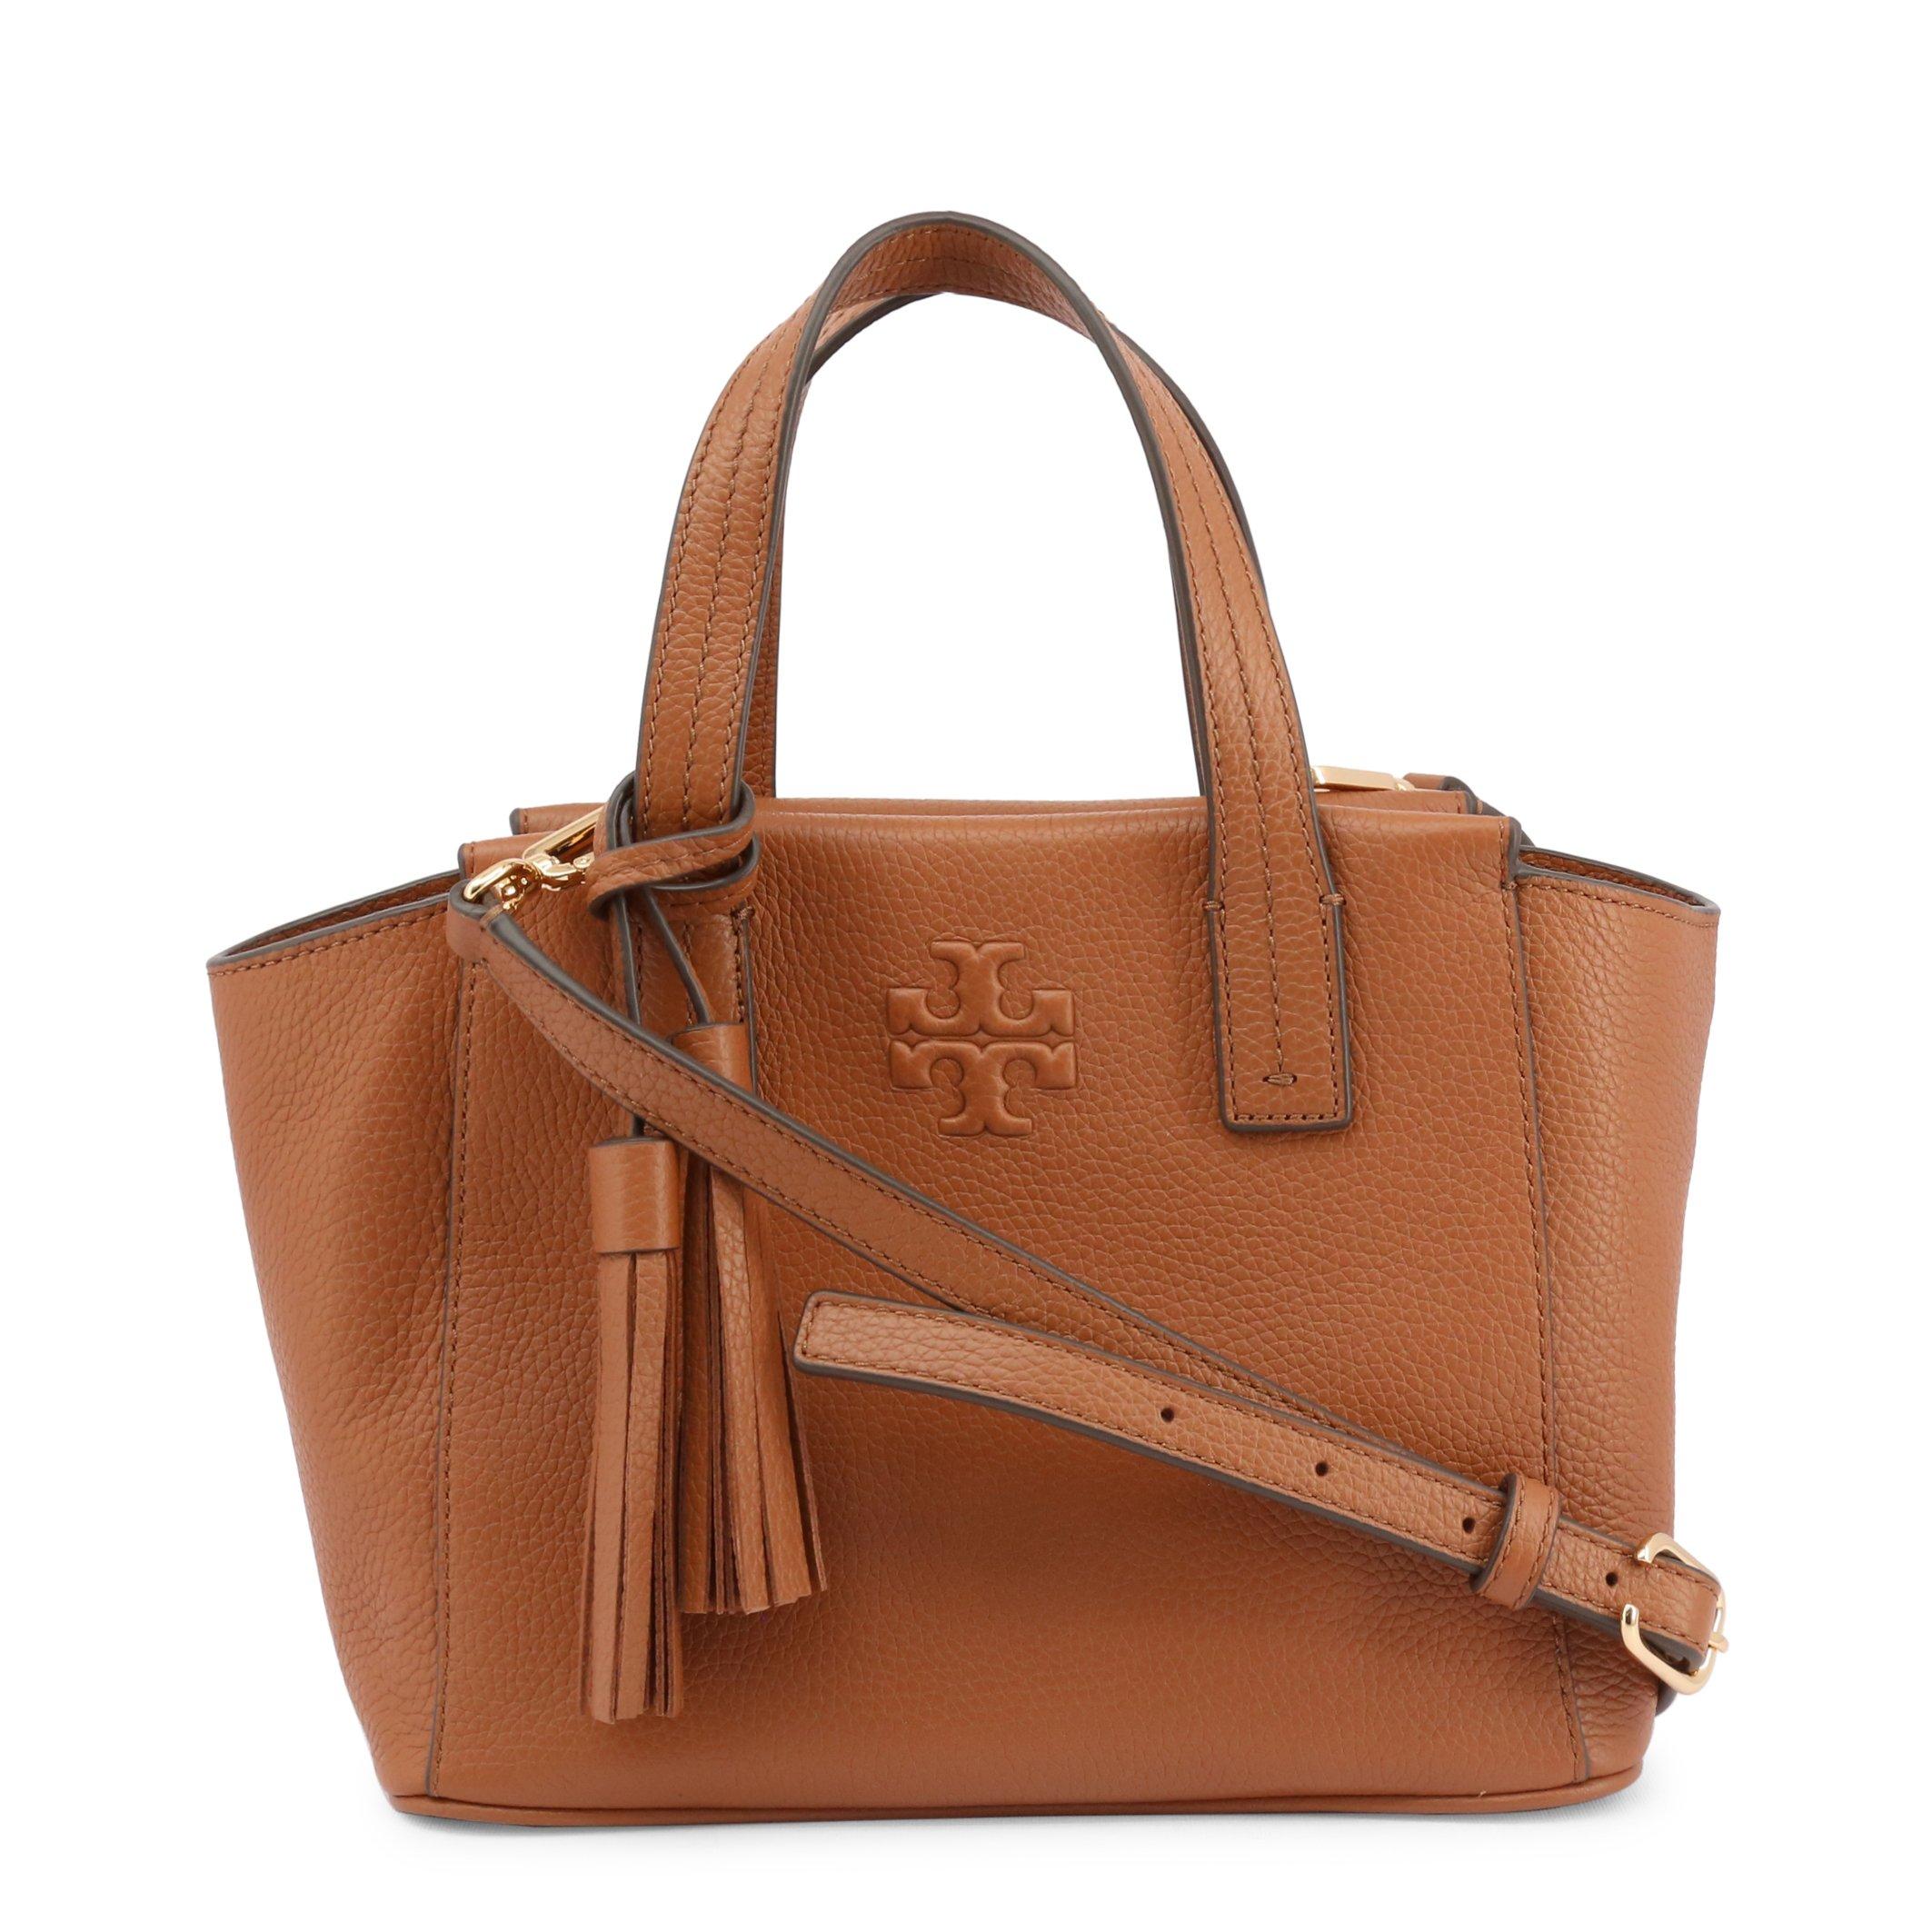 Tory Burch Women's Handbag Various Colours 77165 - brown NOSIZE